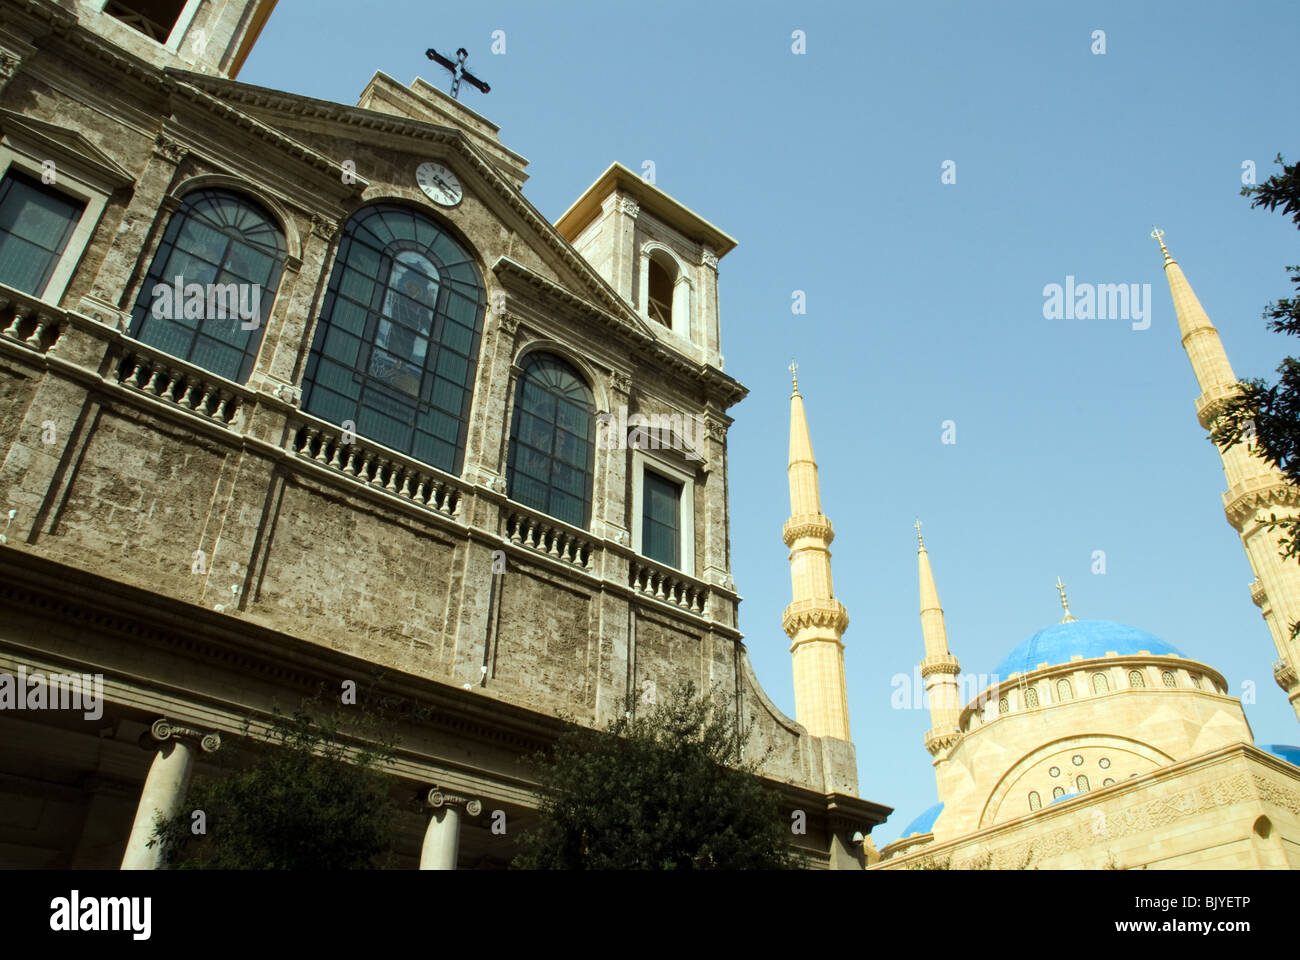 Église et mosquée Beyrouth Liban Photo Stock